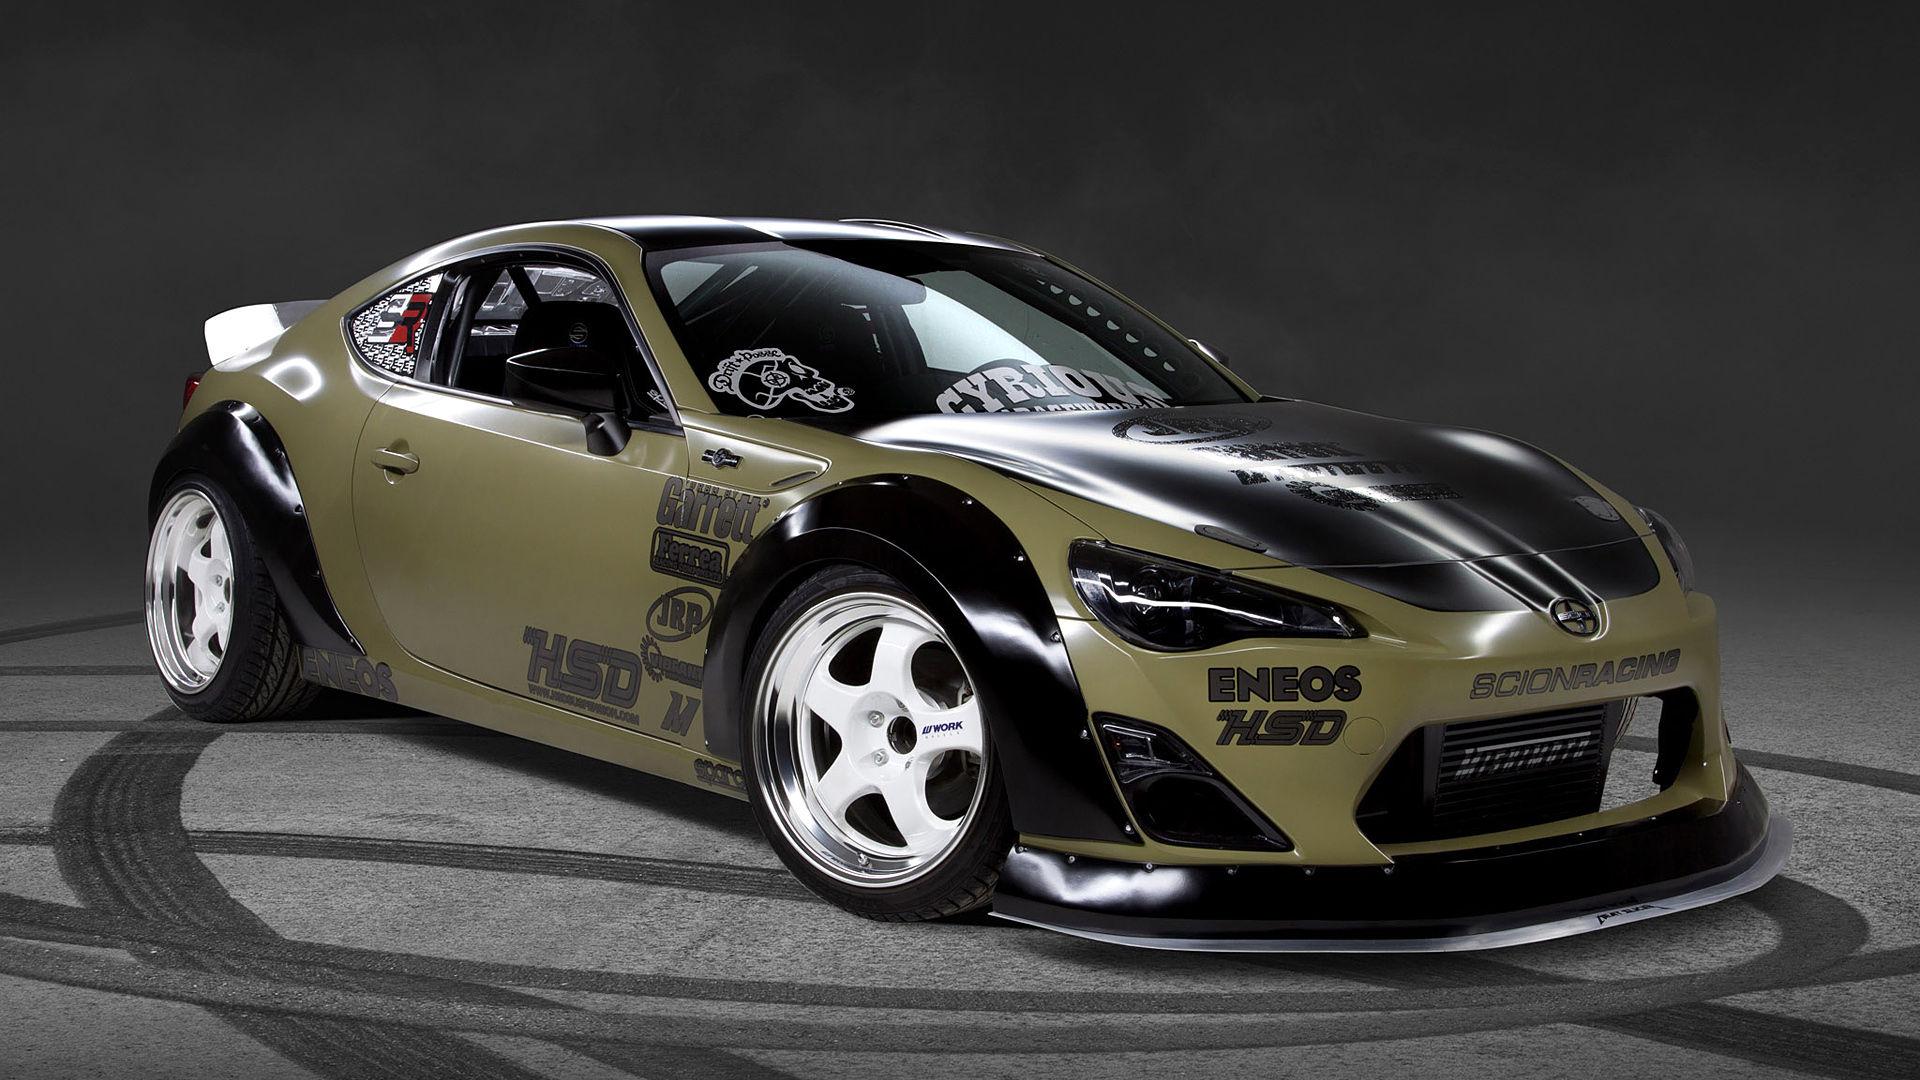 2013 Scion FR-S by Cyrious Garageworks